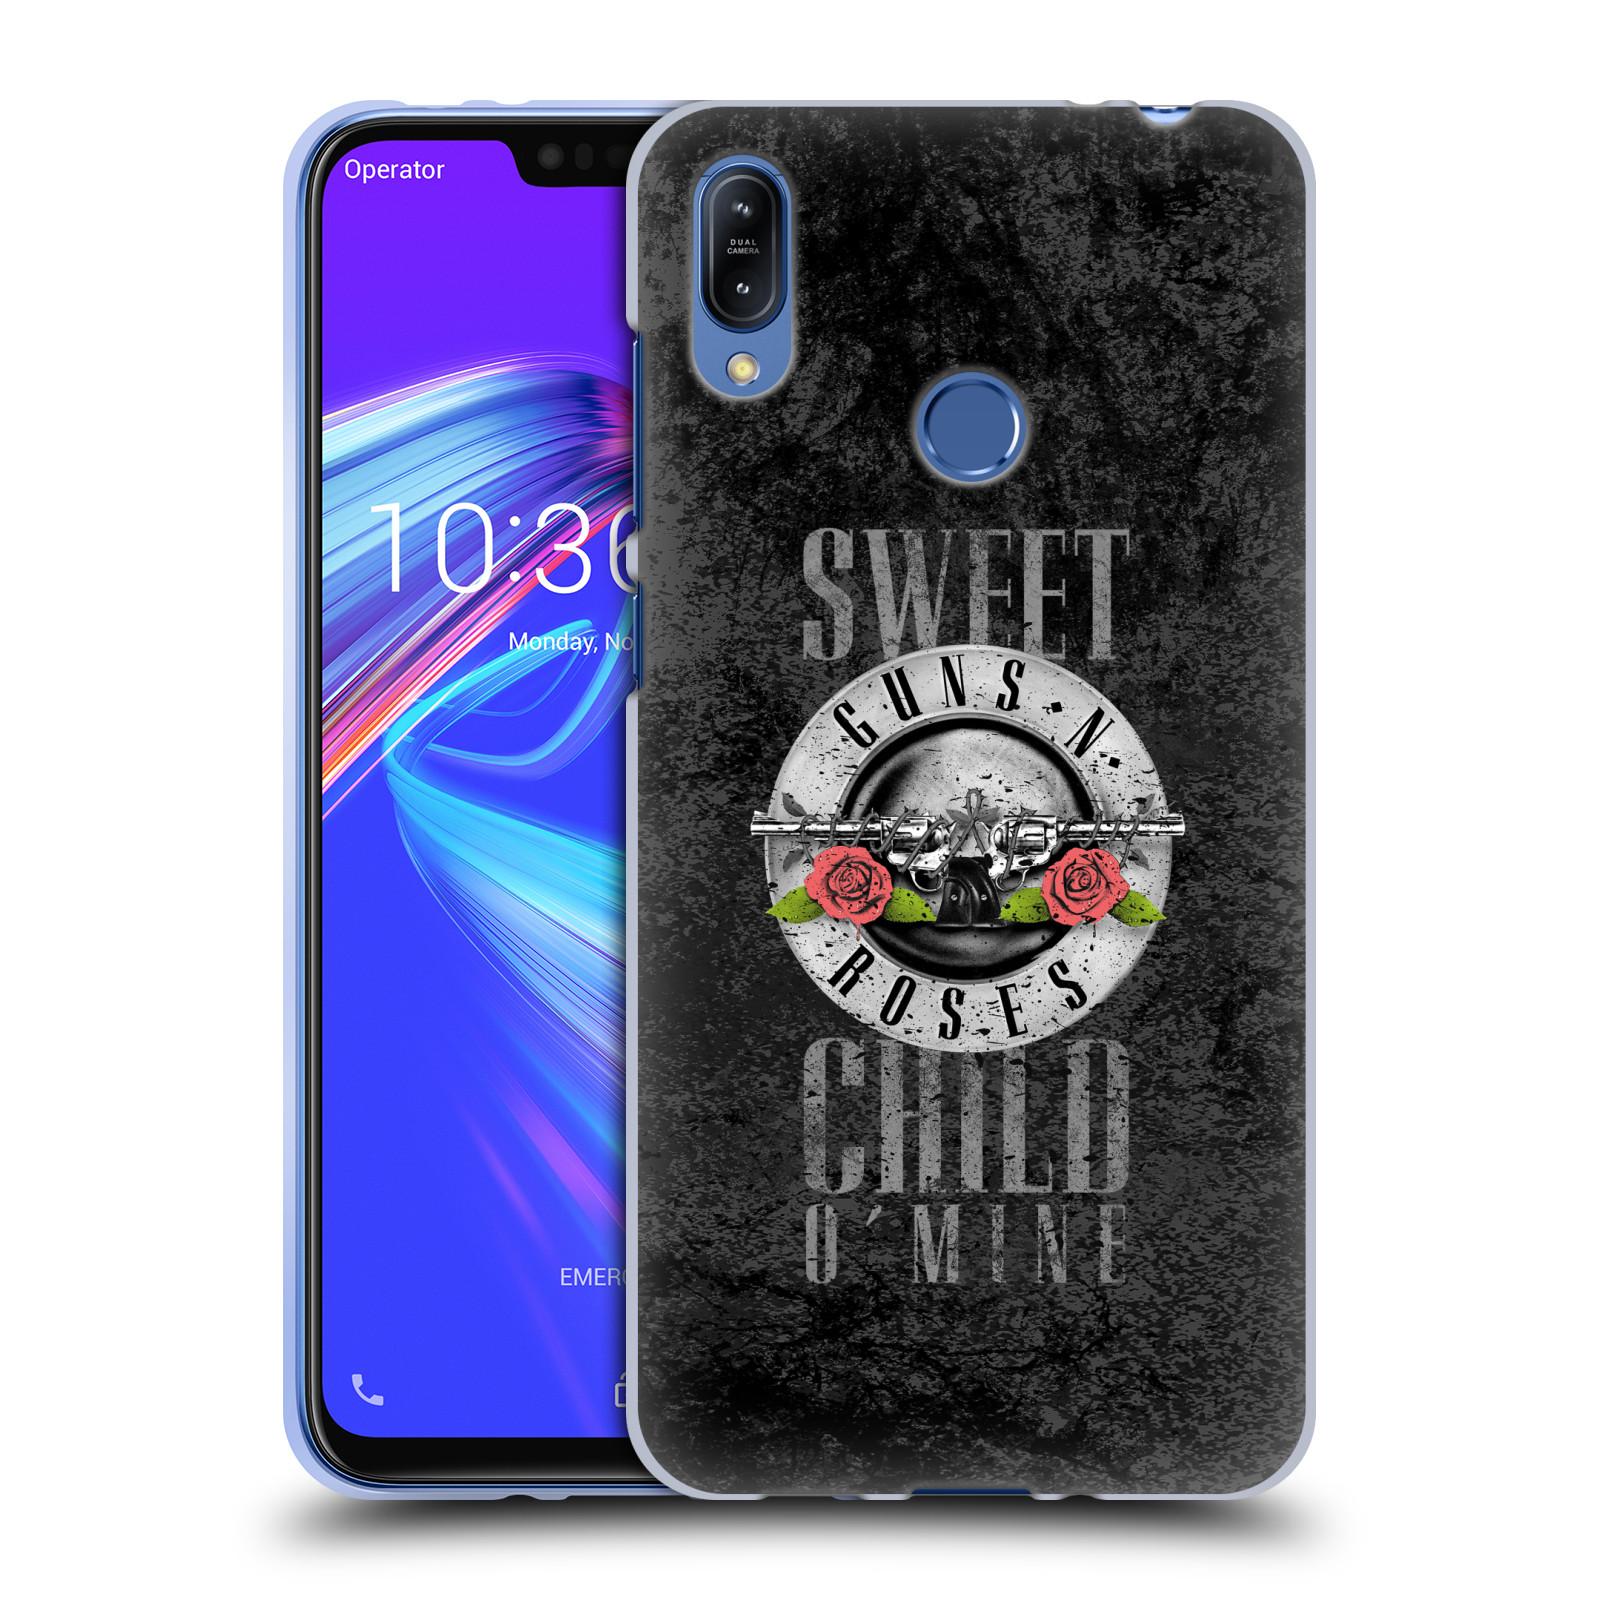 Silikonové pouzdro na mobil Asus Zenfone Max (M2) ZB633KL - Head Case - Guns N' Roses - Sweet Child